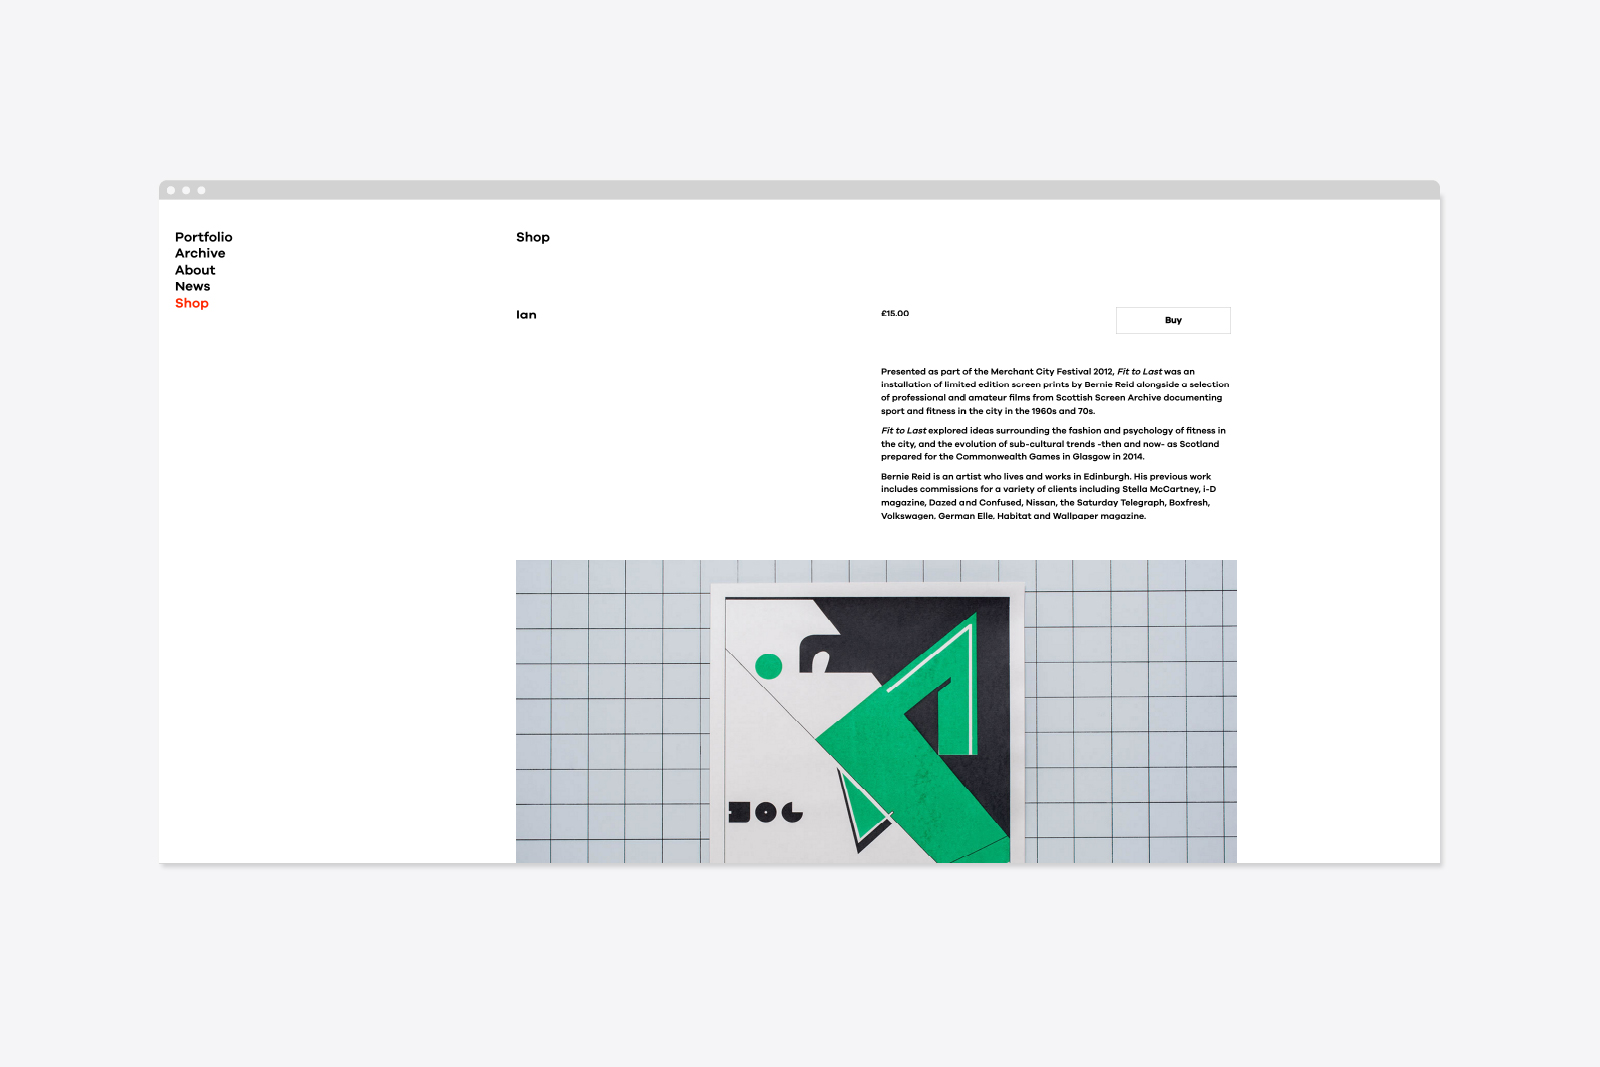 ostreet-panel-web-10